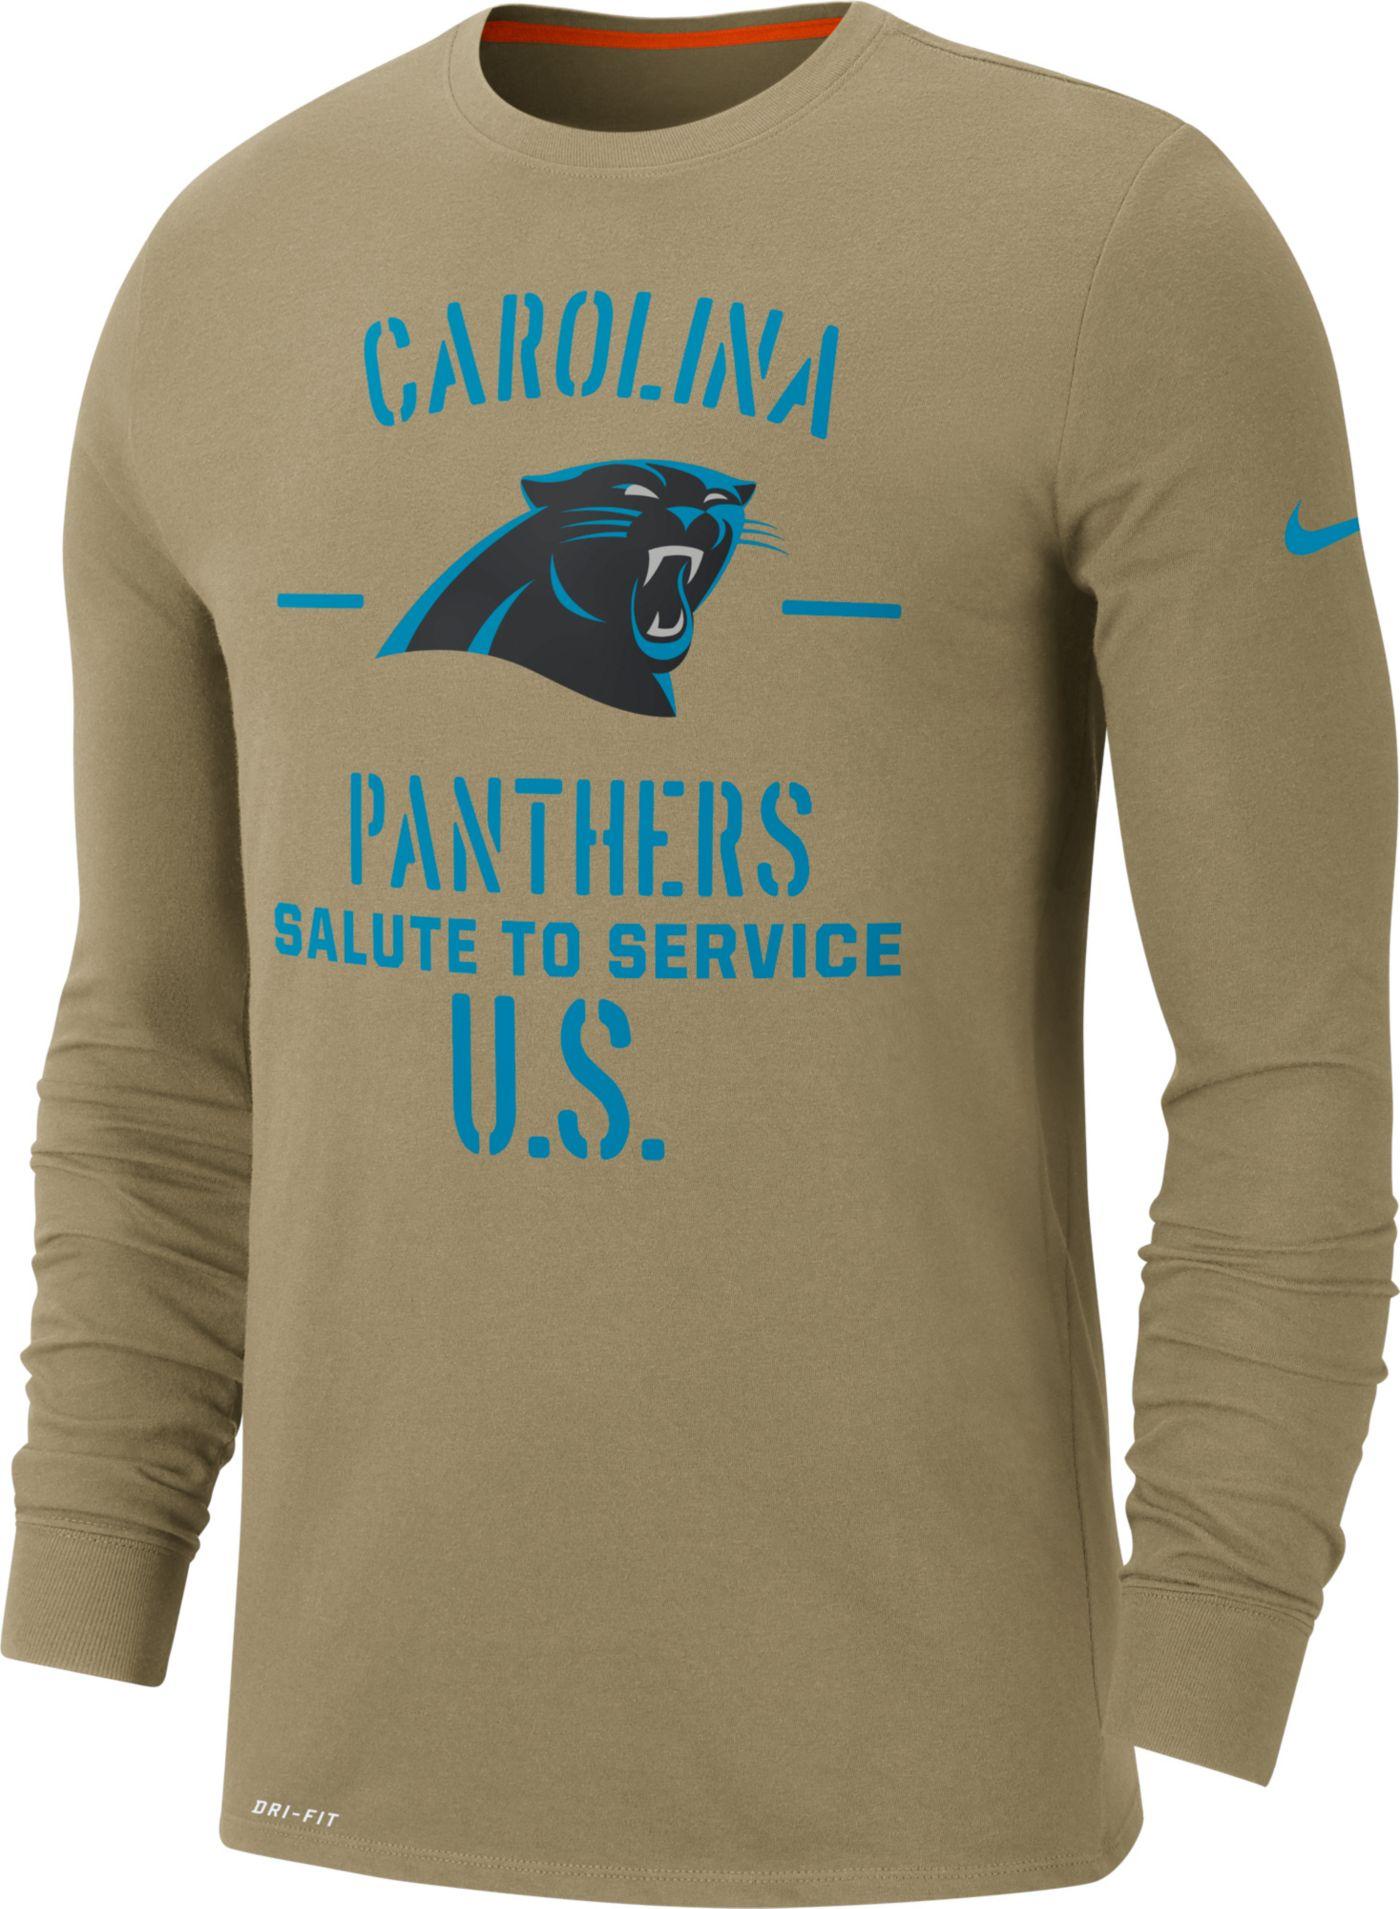 Nike Men's Salute to Service Carolina Panthers Dri-FIT Beige Long Sleeve Shirt